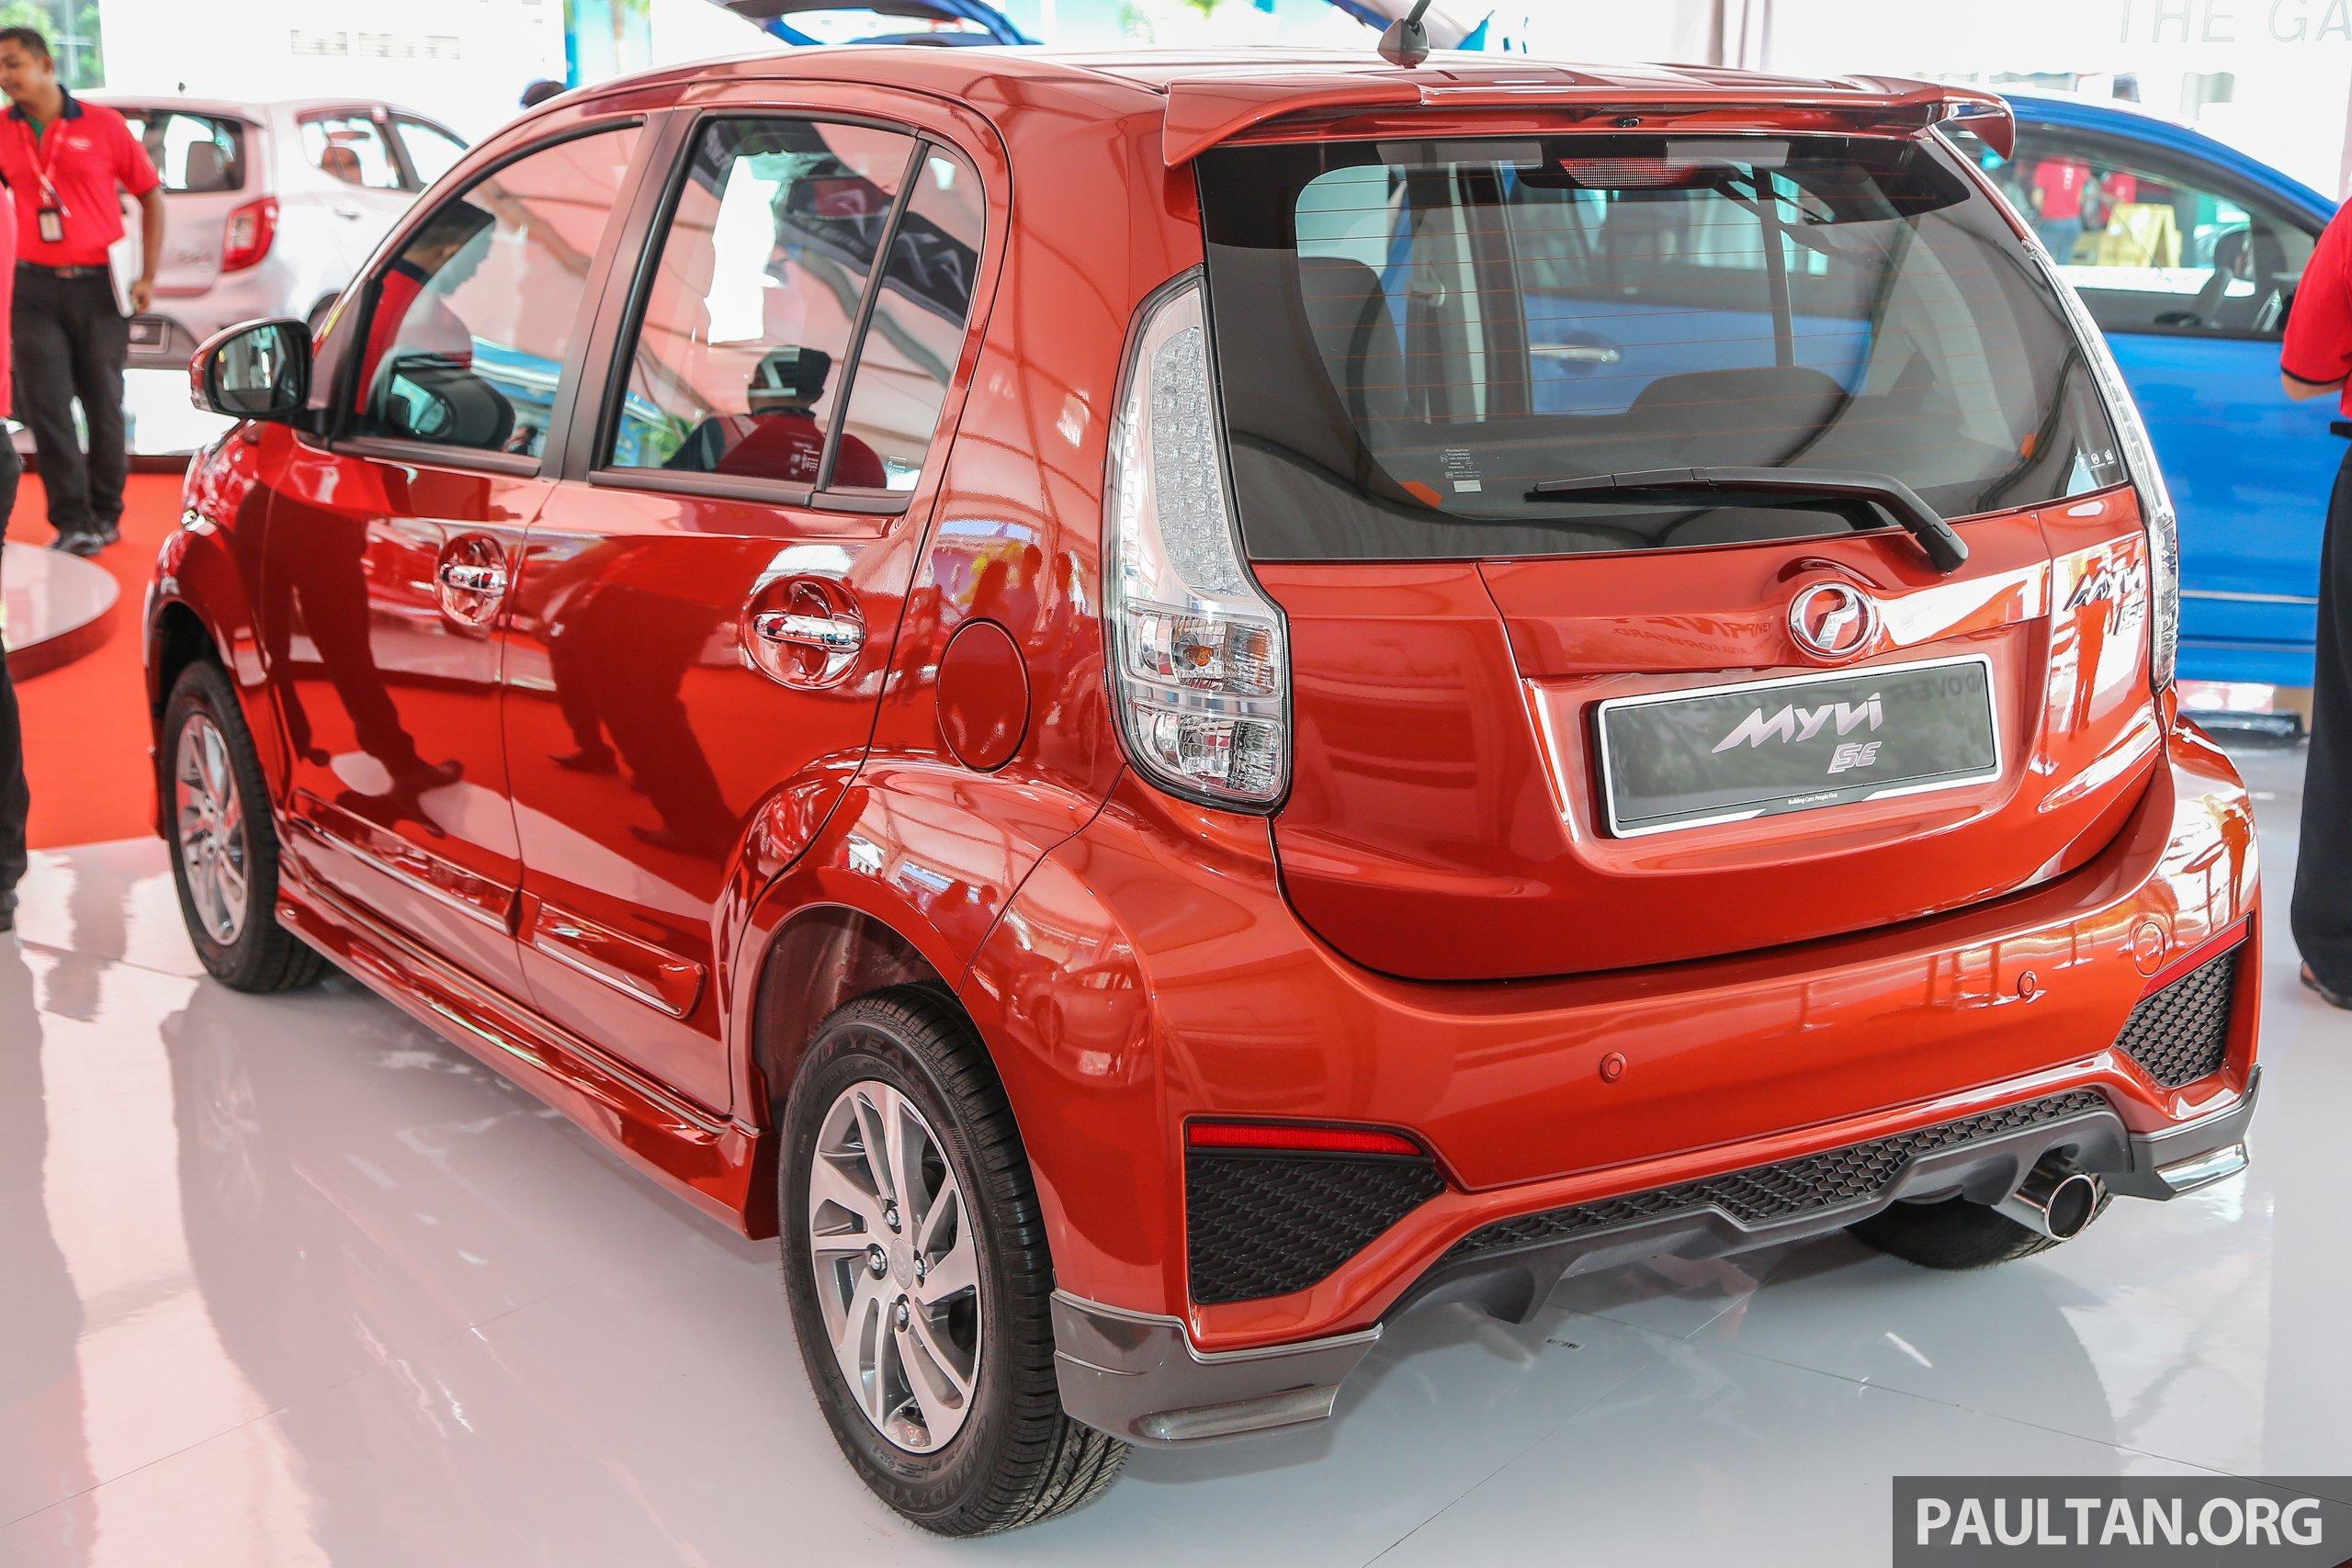 Myvi Se 1.5 >> Perodua Myvi 1.5 SE, Advance get standard GearUp kit Image 606840